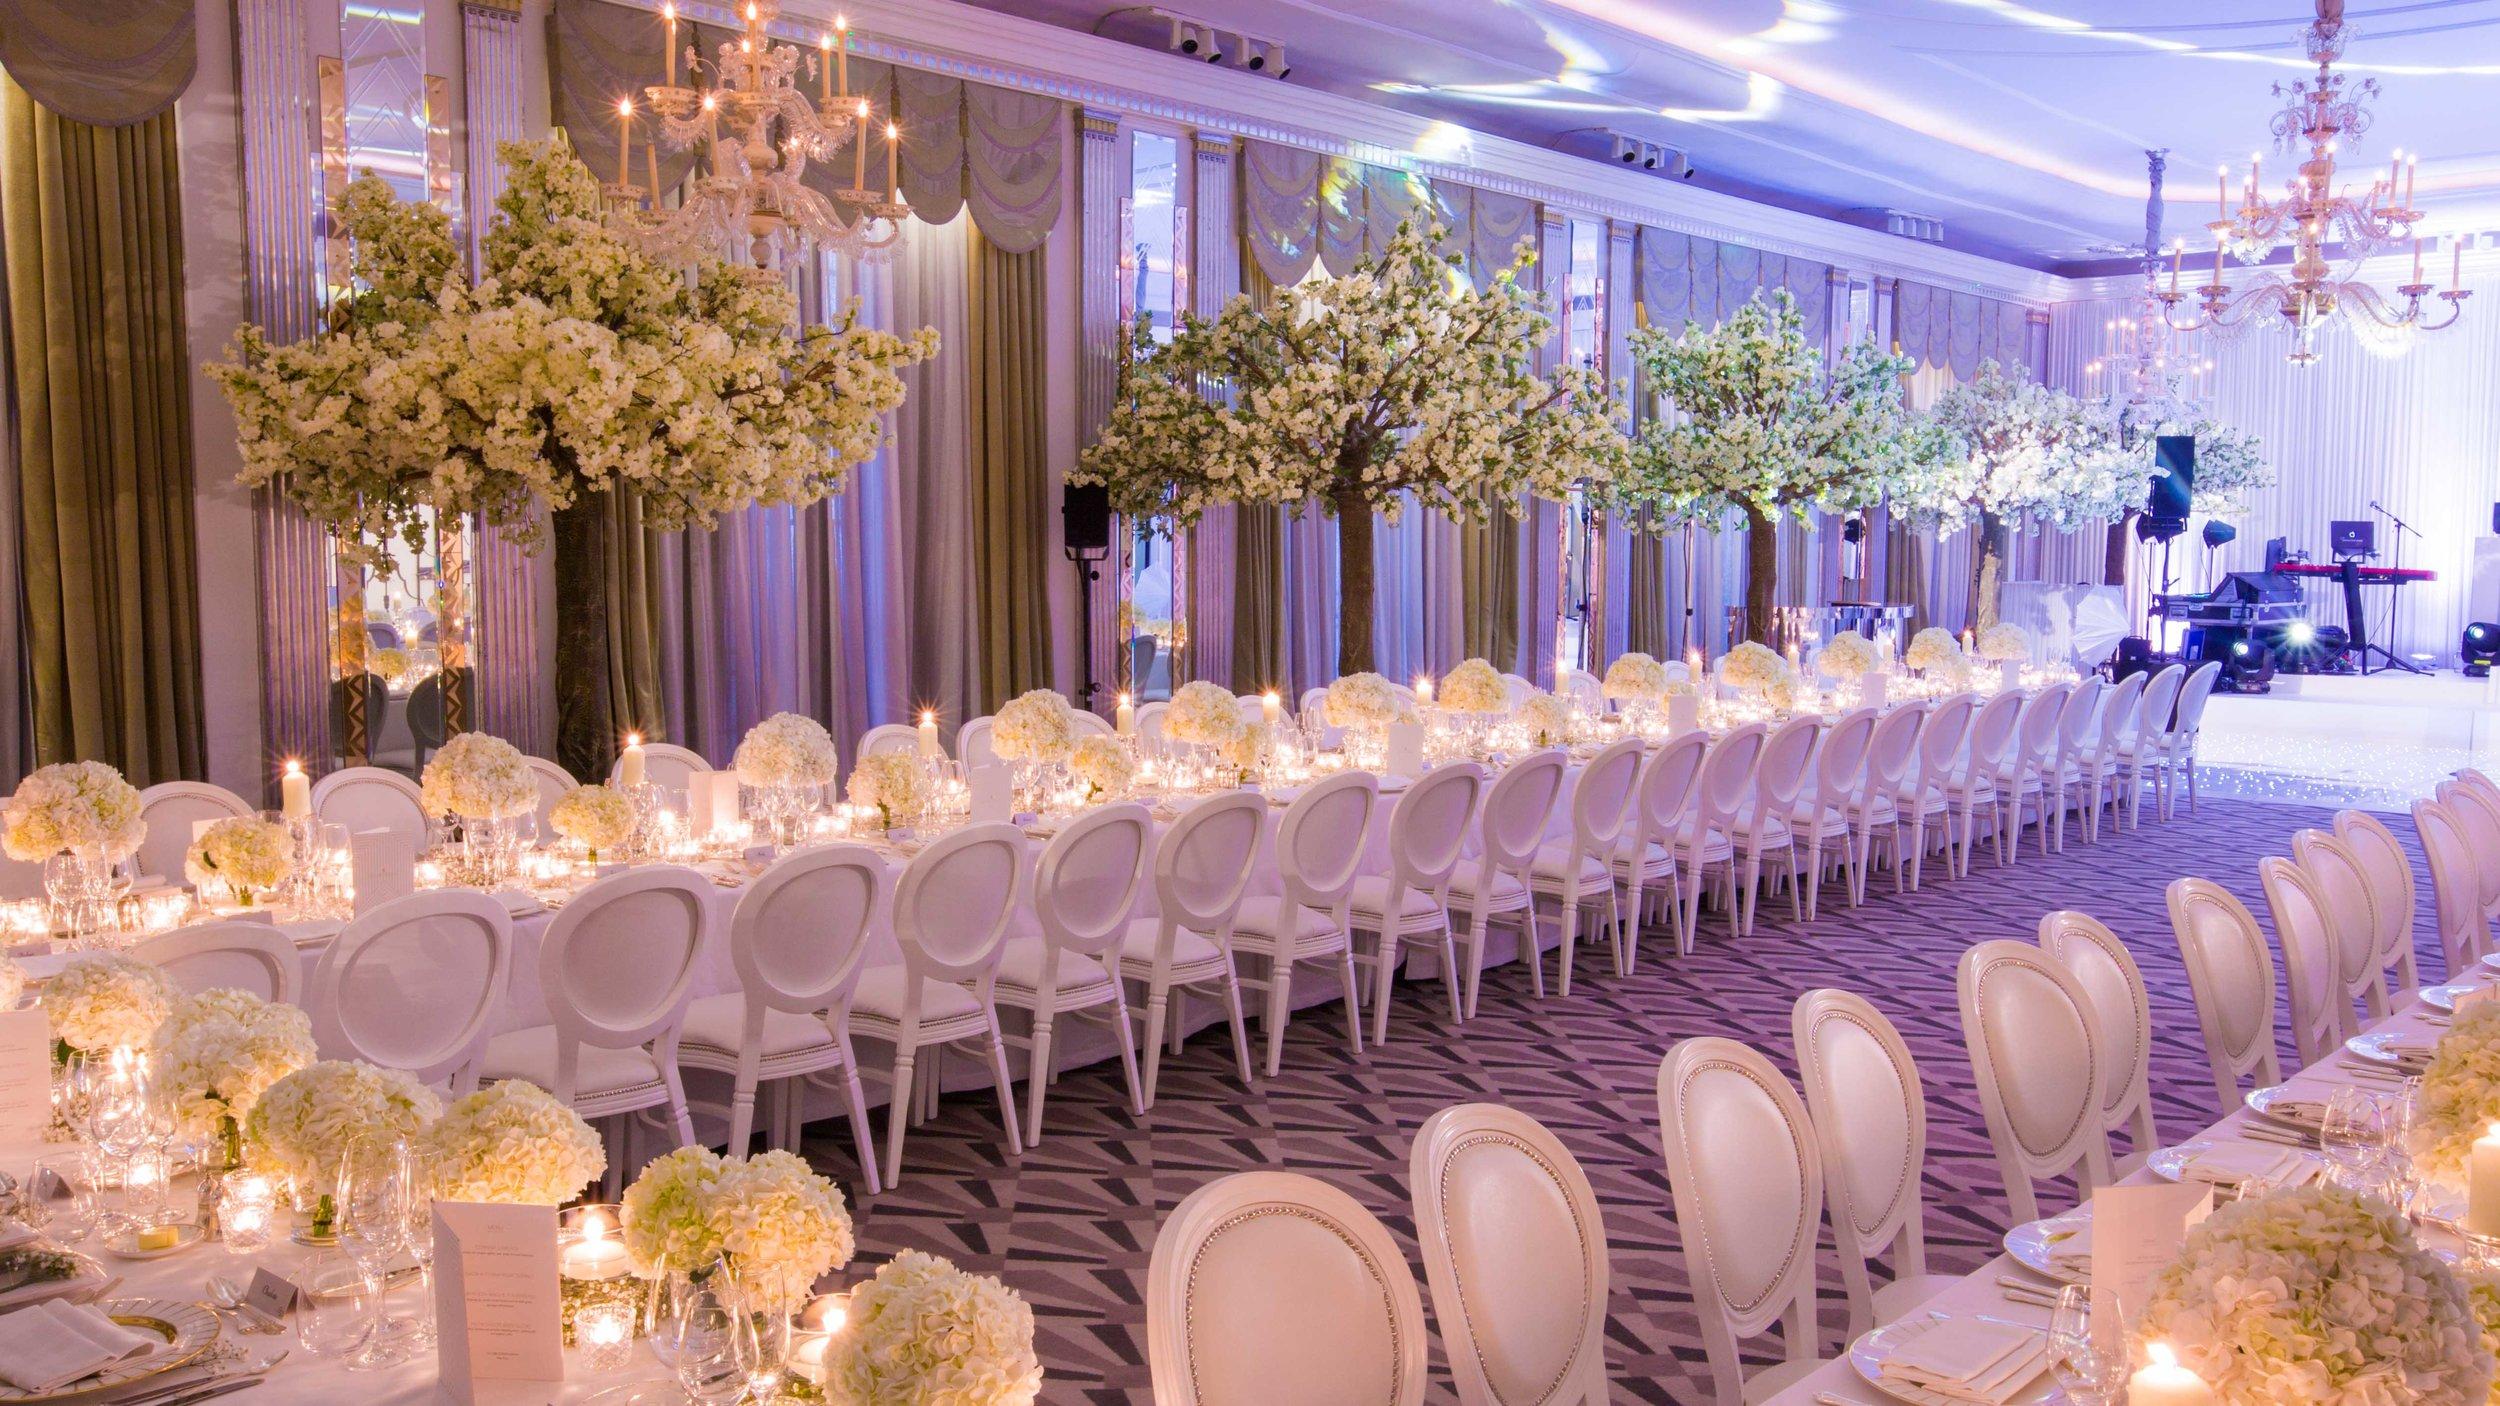 claridges-hotel-wedding-photographer-london-mayfair-natalia-smith-photography-90.jpg